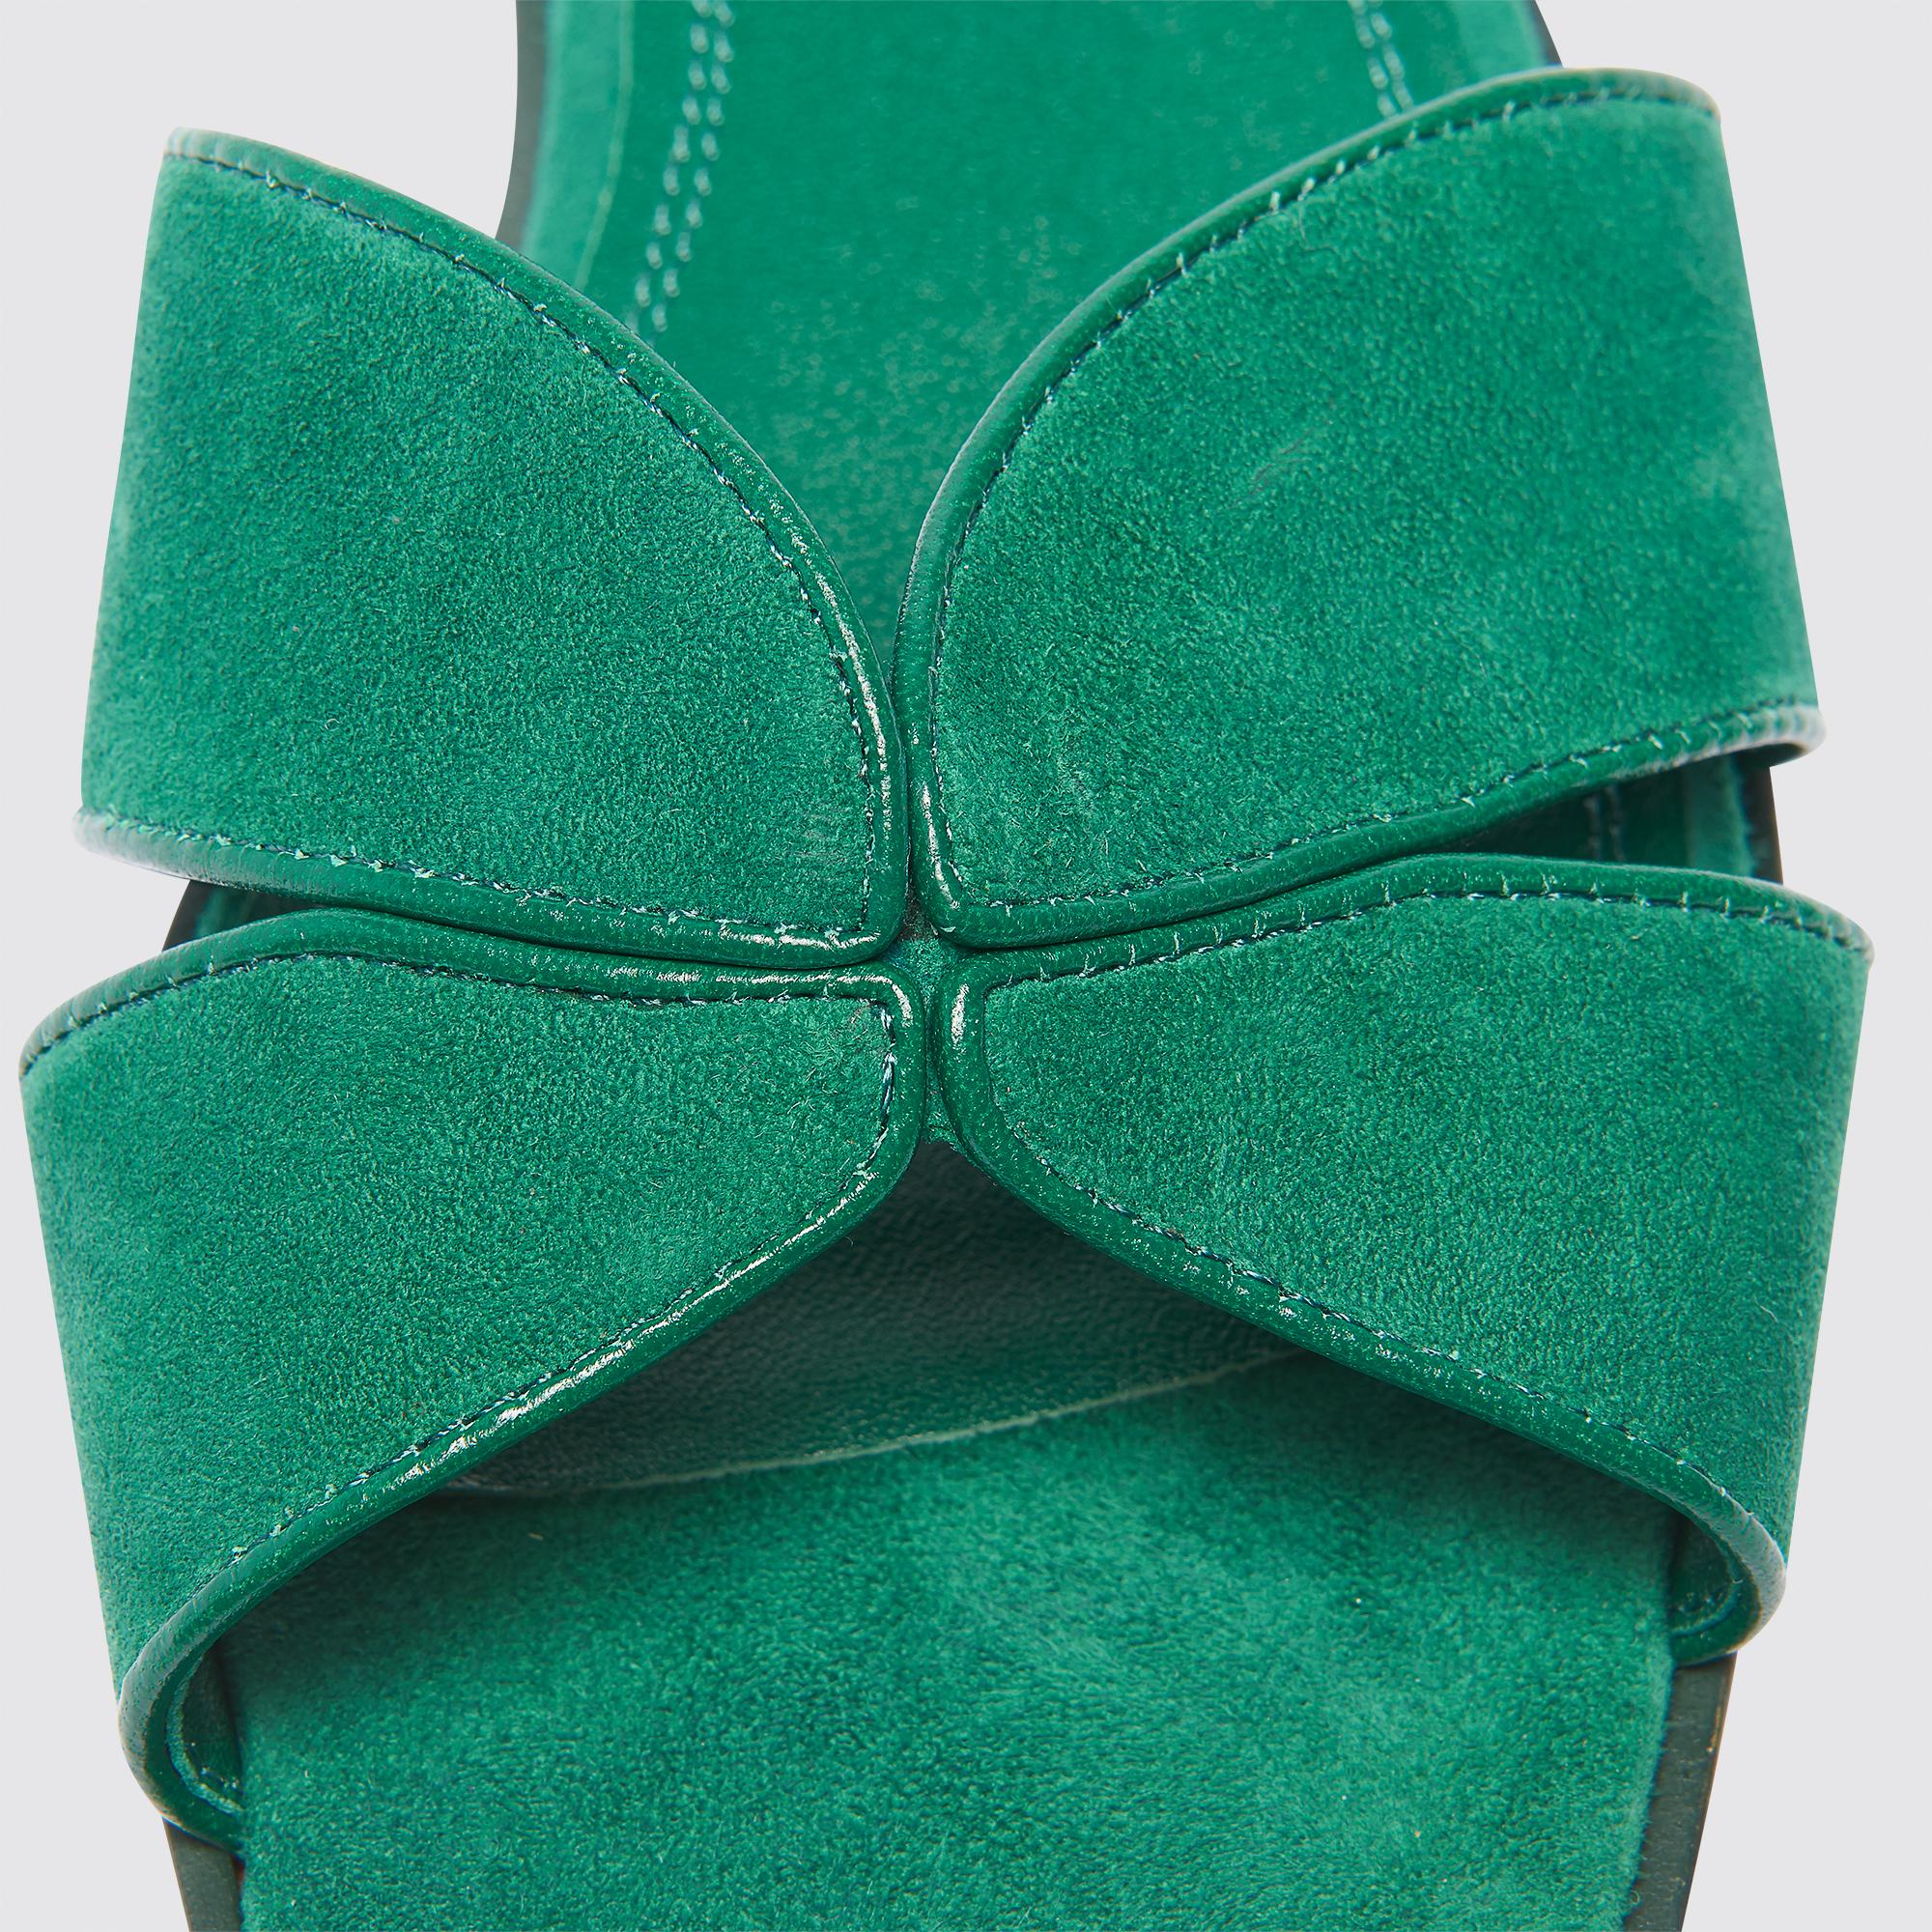 Sandali piatti incrociati in pelle : Sandali colore Verde Abete